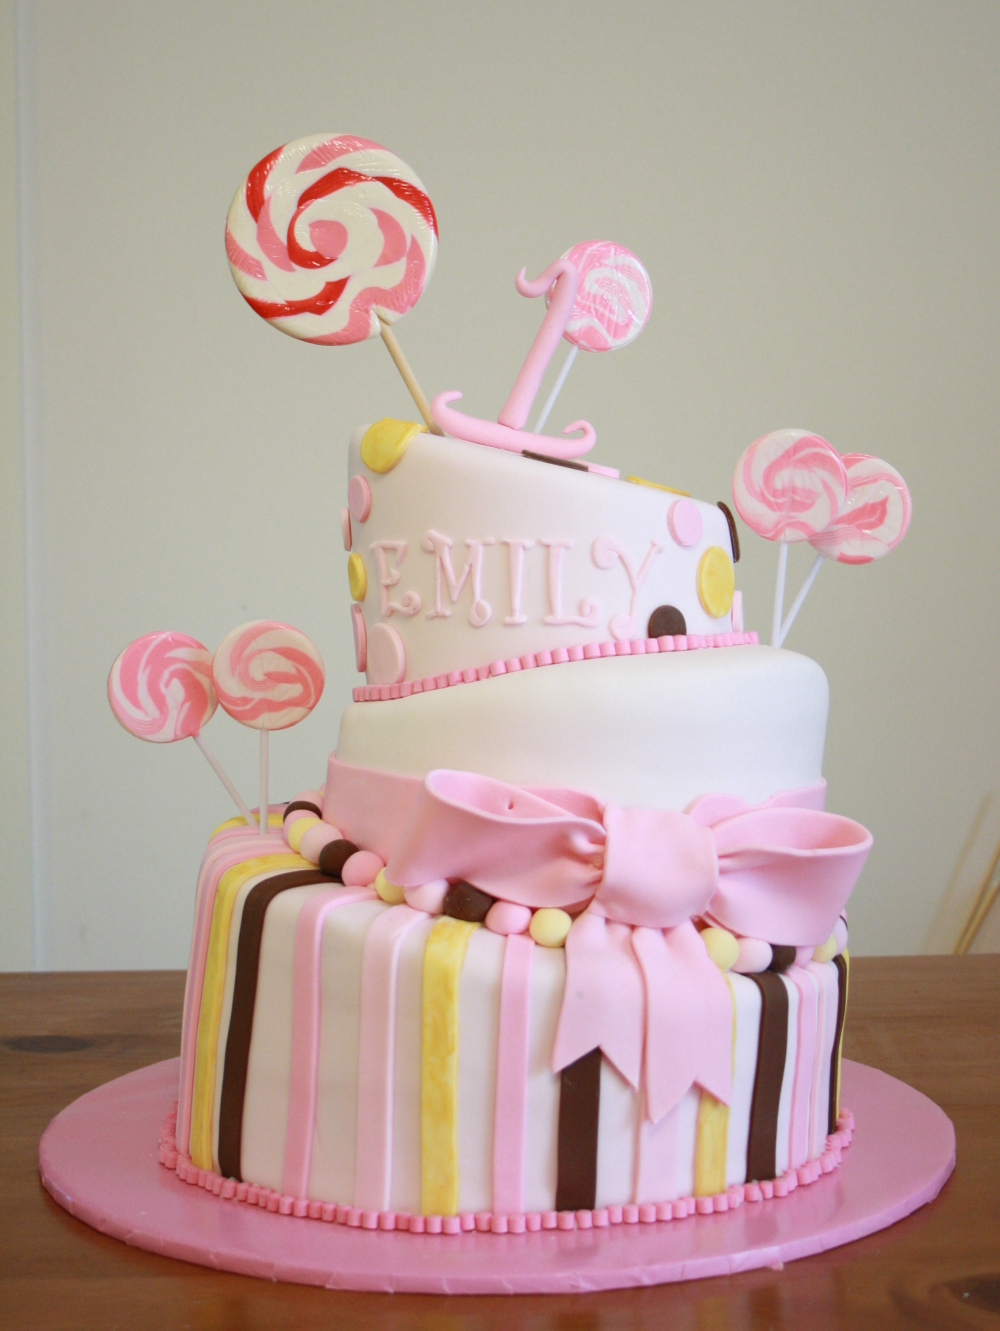 Becca s Musings: My Little Girls Birthday Cakes